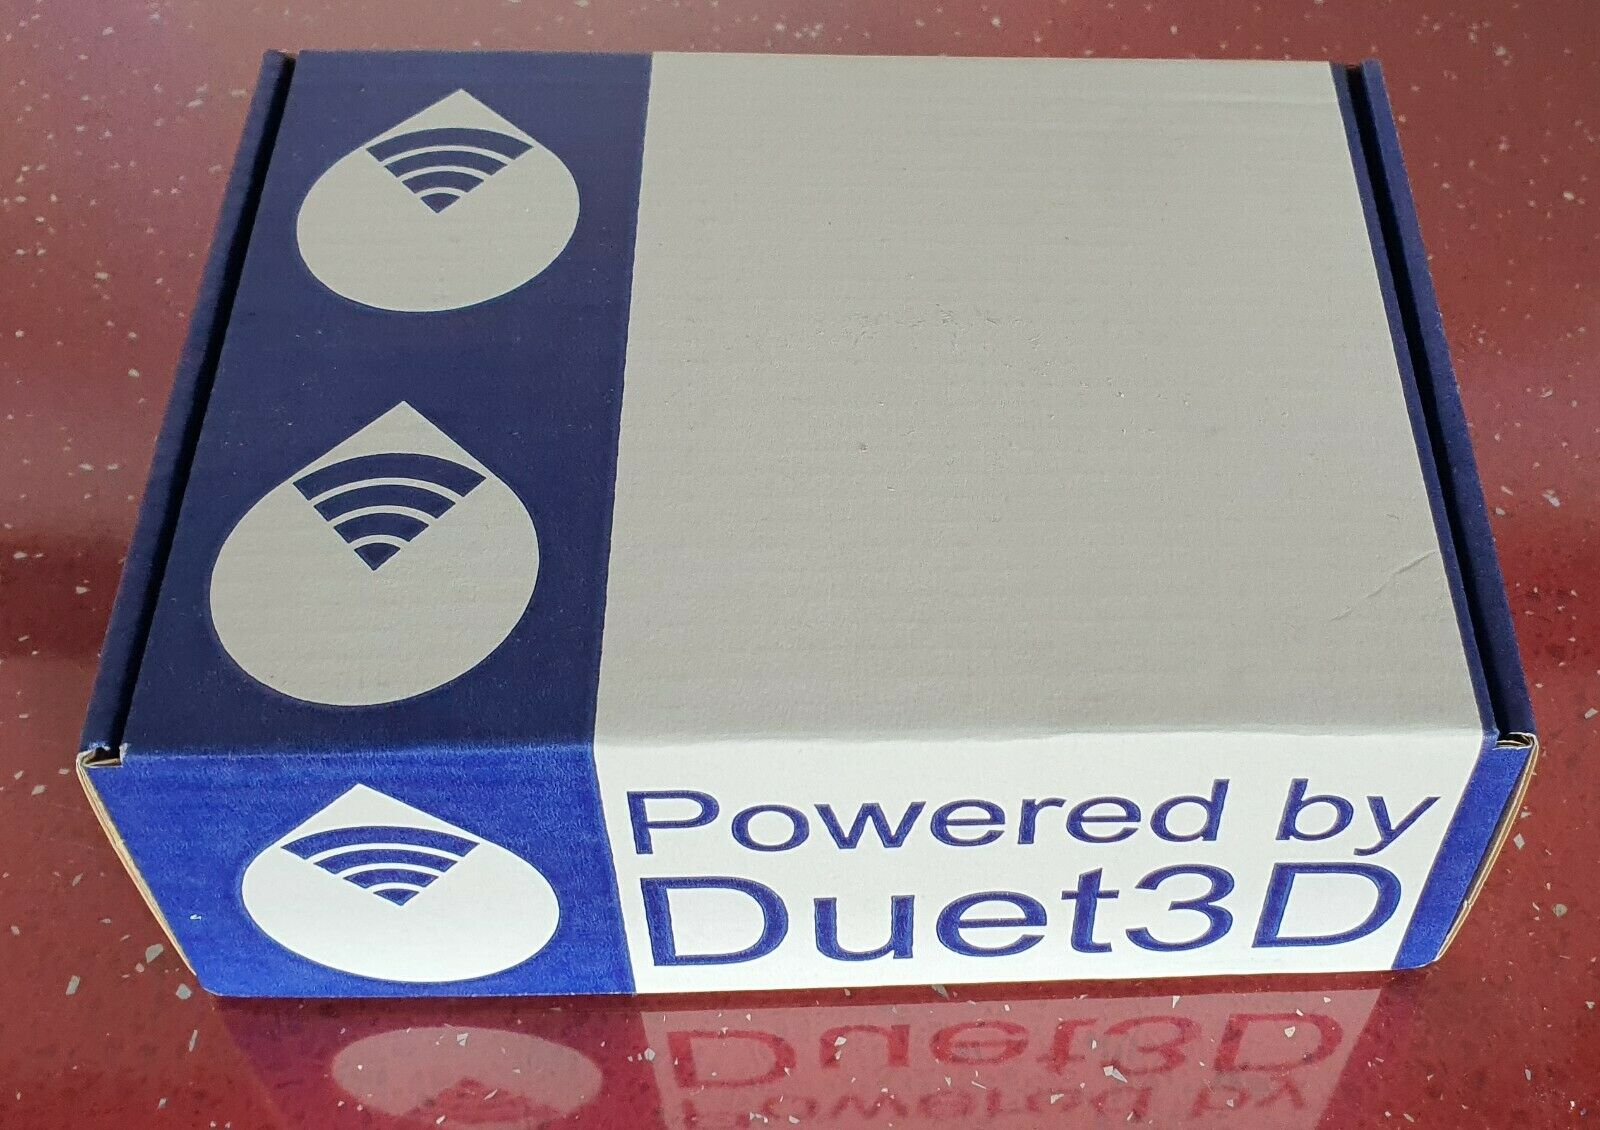 Genuine Duet3d Duet 2 Ethernet Controller 3D printers - UK stock - 10% off RRP